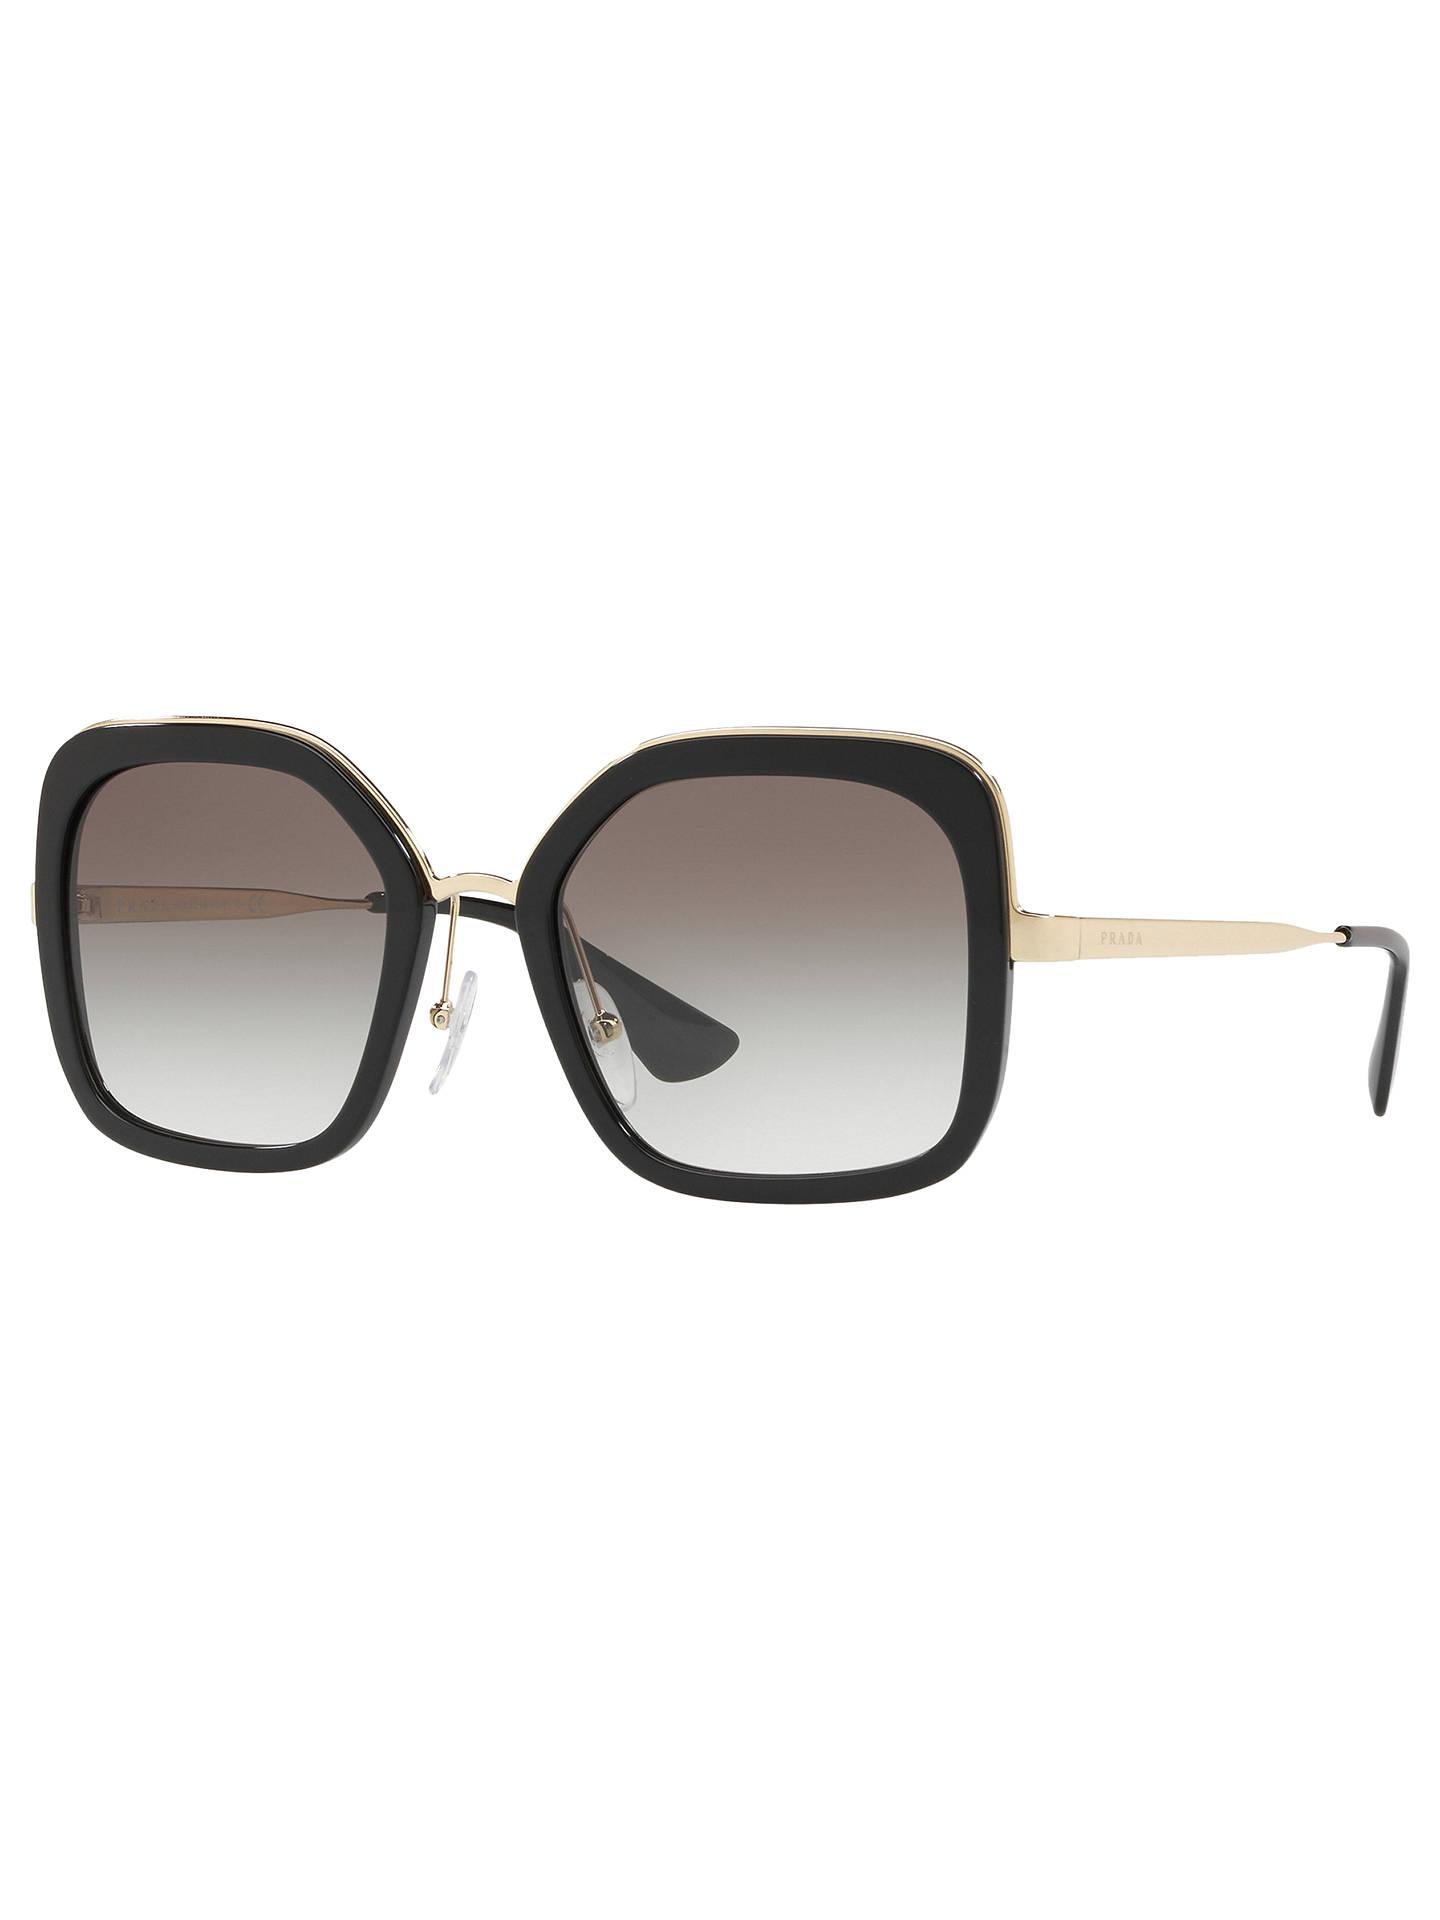 30645d83a35 Prada PR 57US Women s Square Sunglasses at John Lewis   Partners